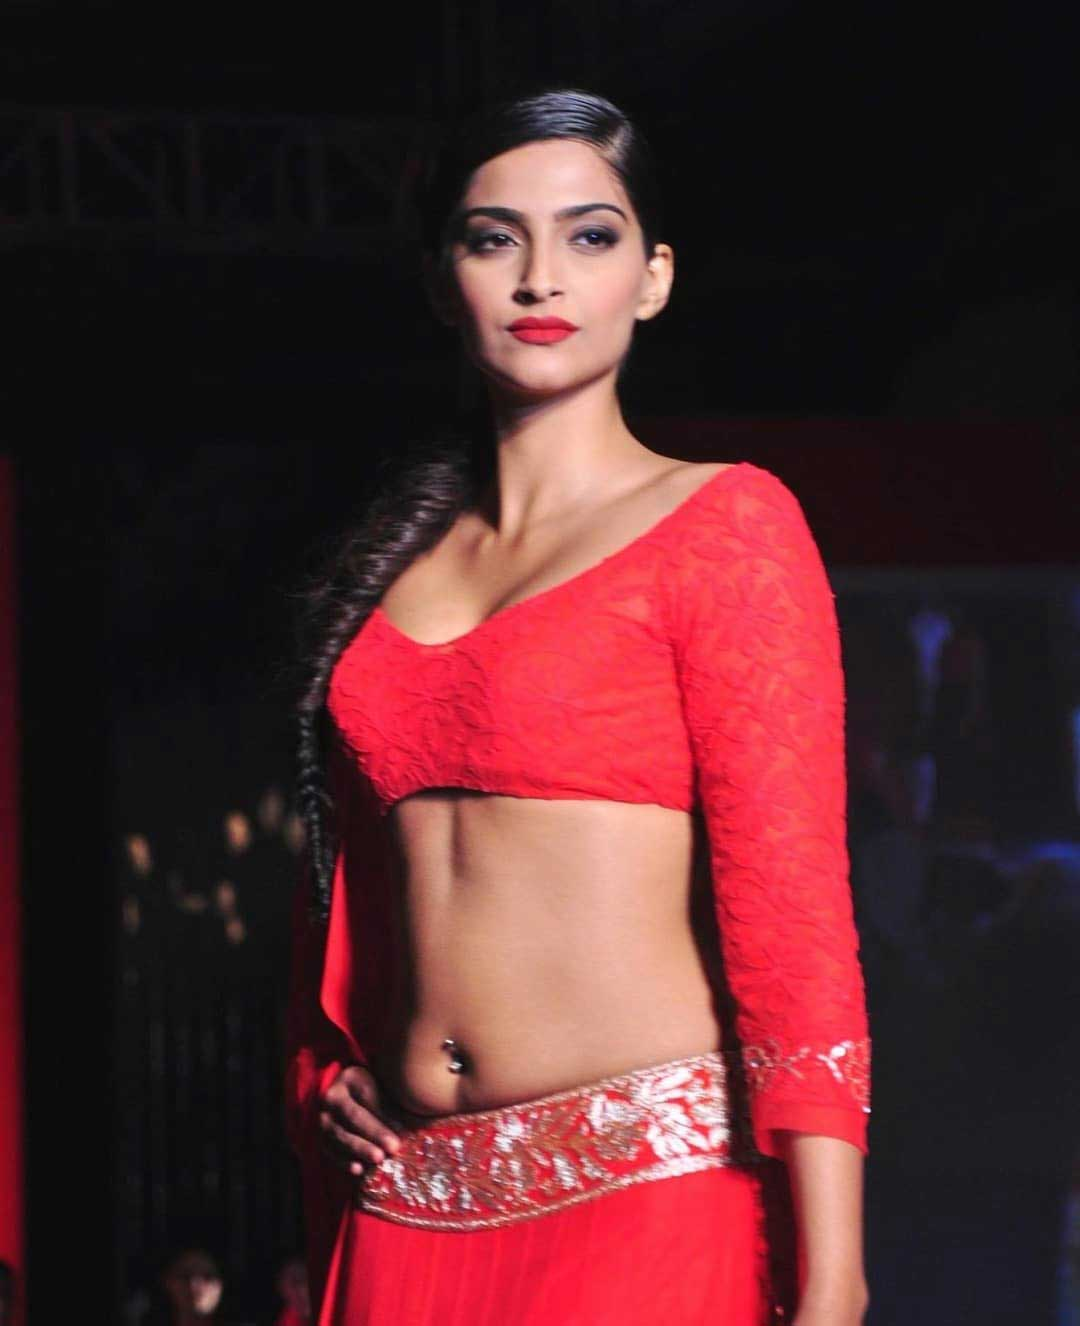 Sonam Kapoor Hot Pierced Navel